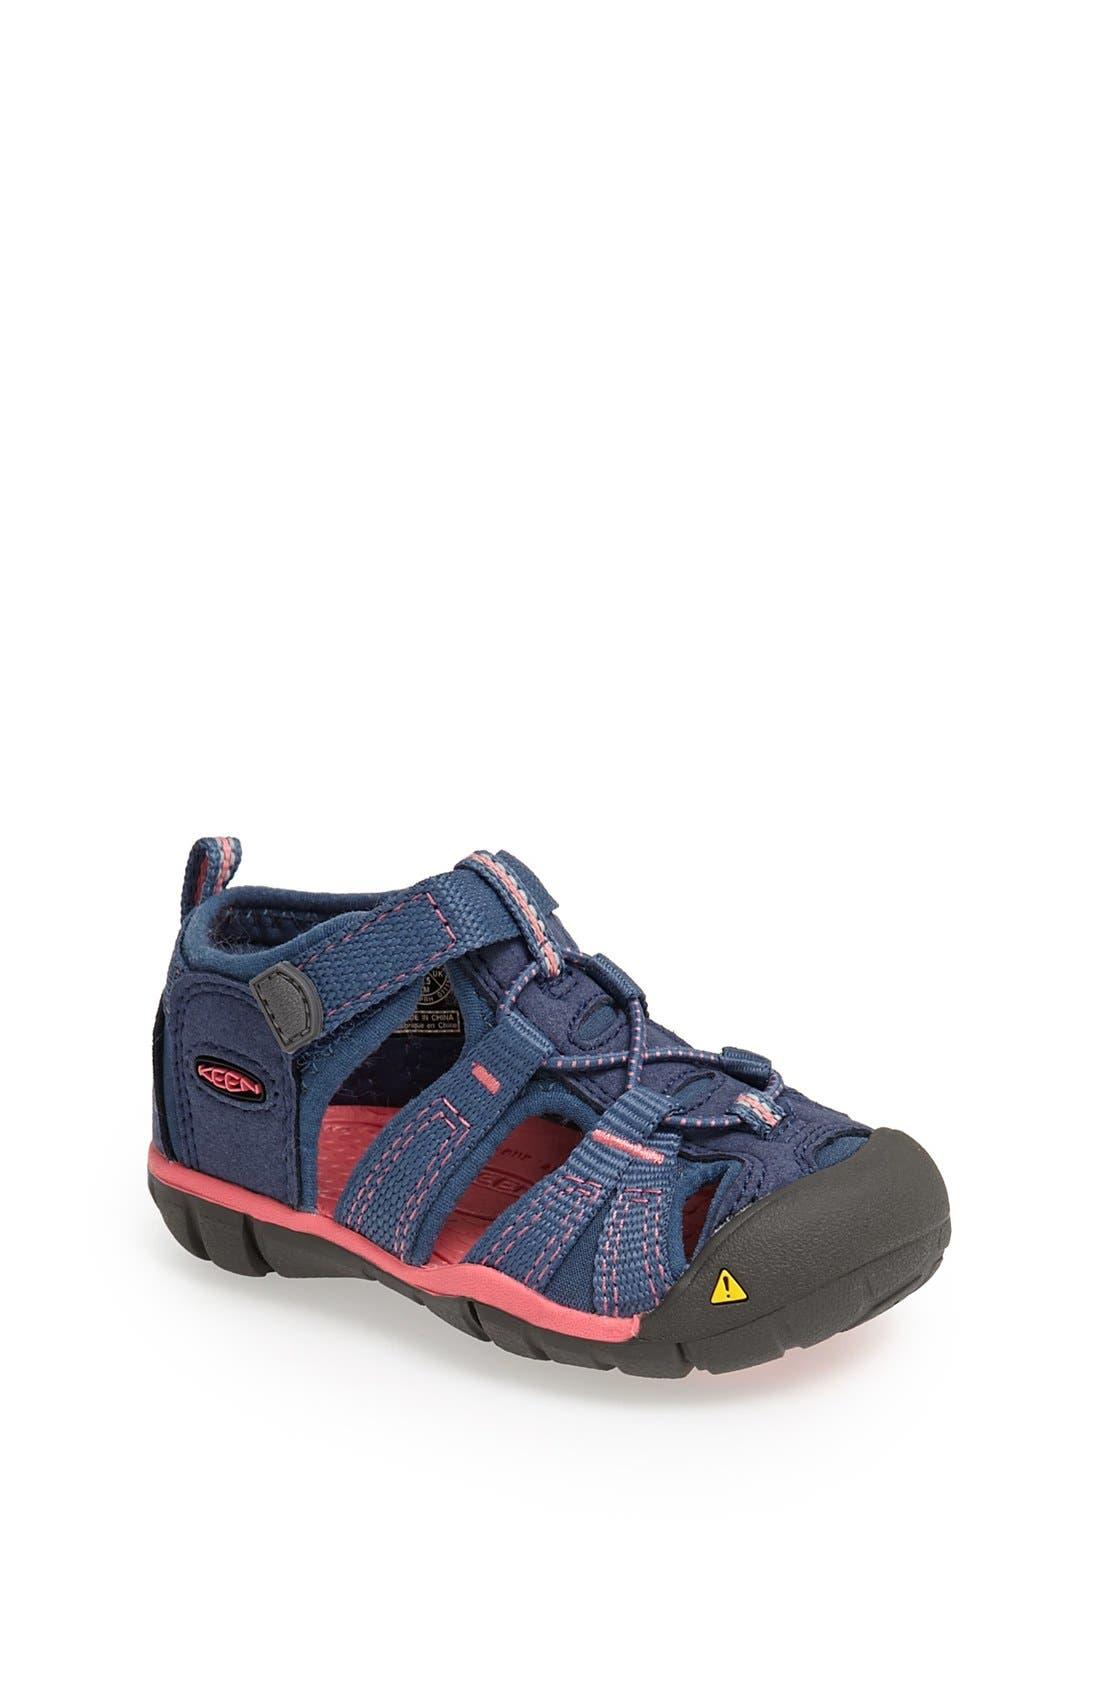 Main Image - Keen 'Seacamp II' Waterproof Sandal (Baby & Walker)